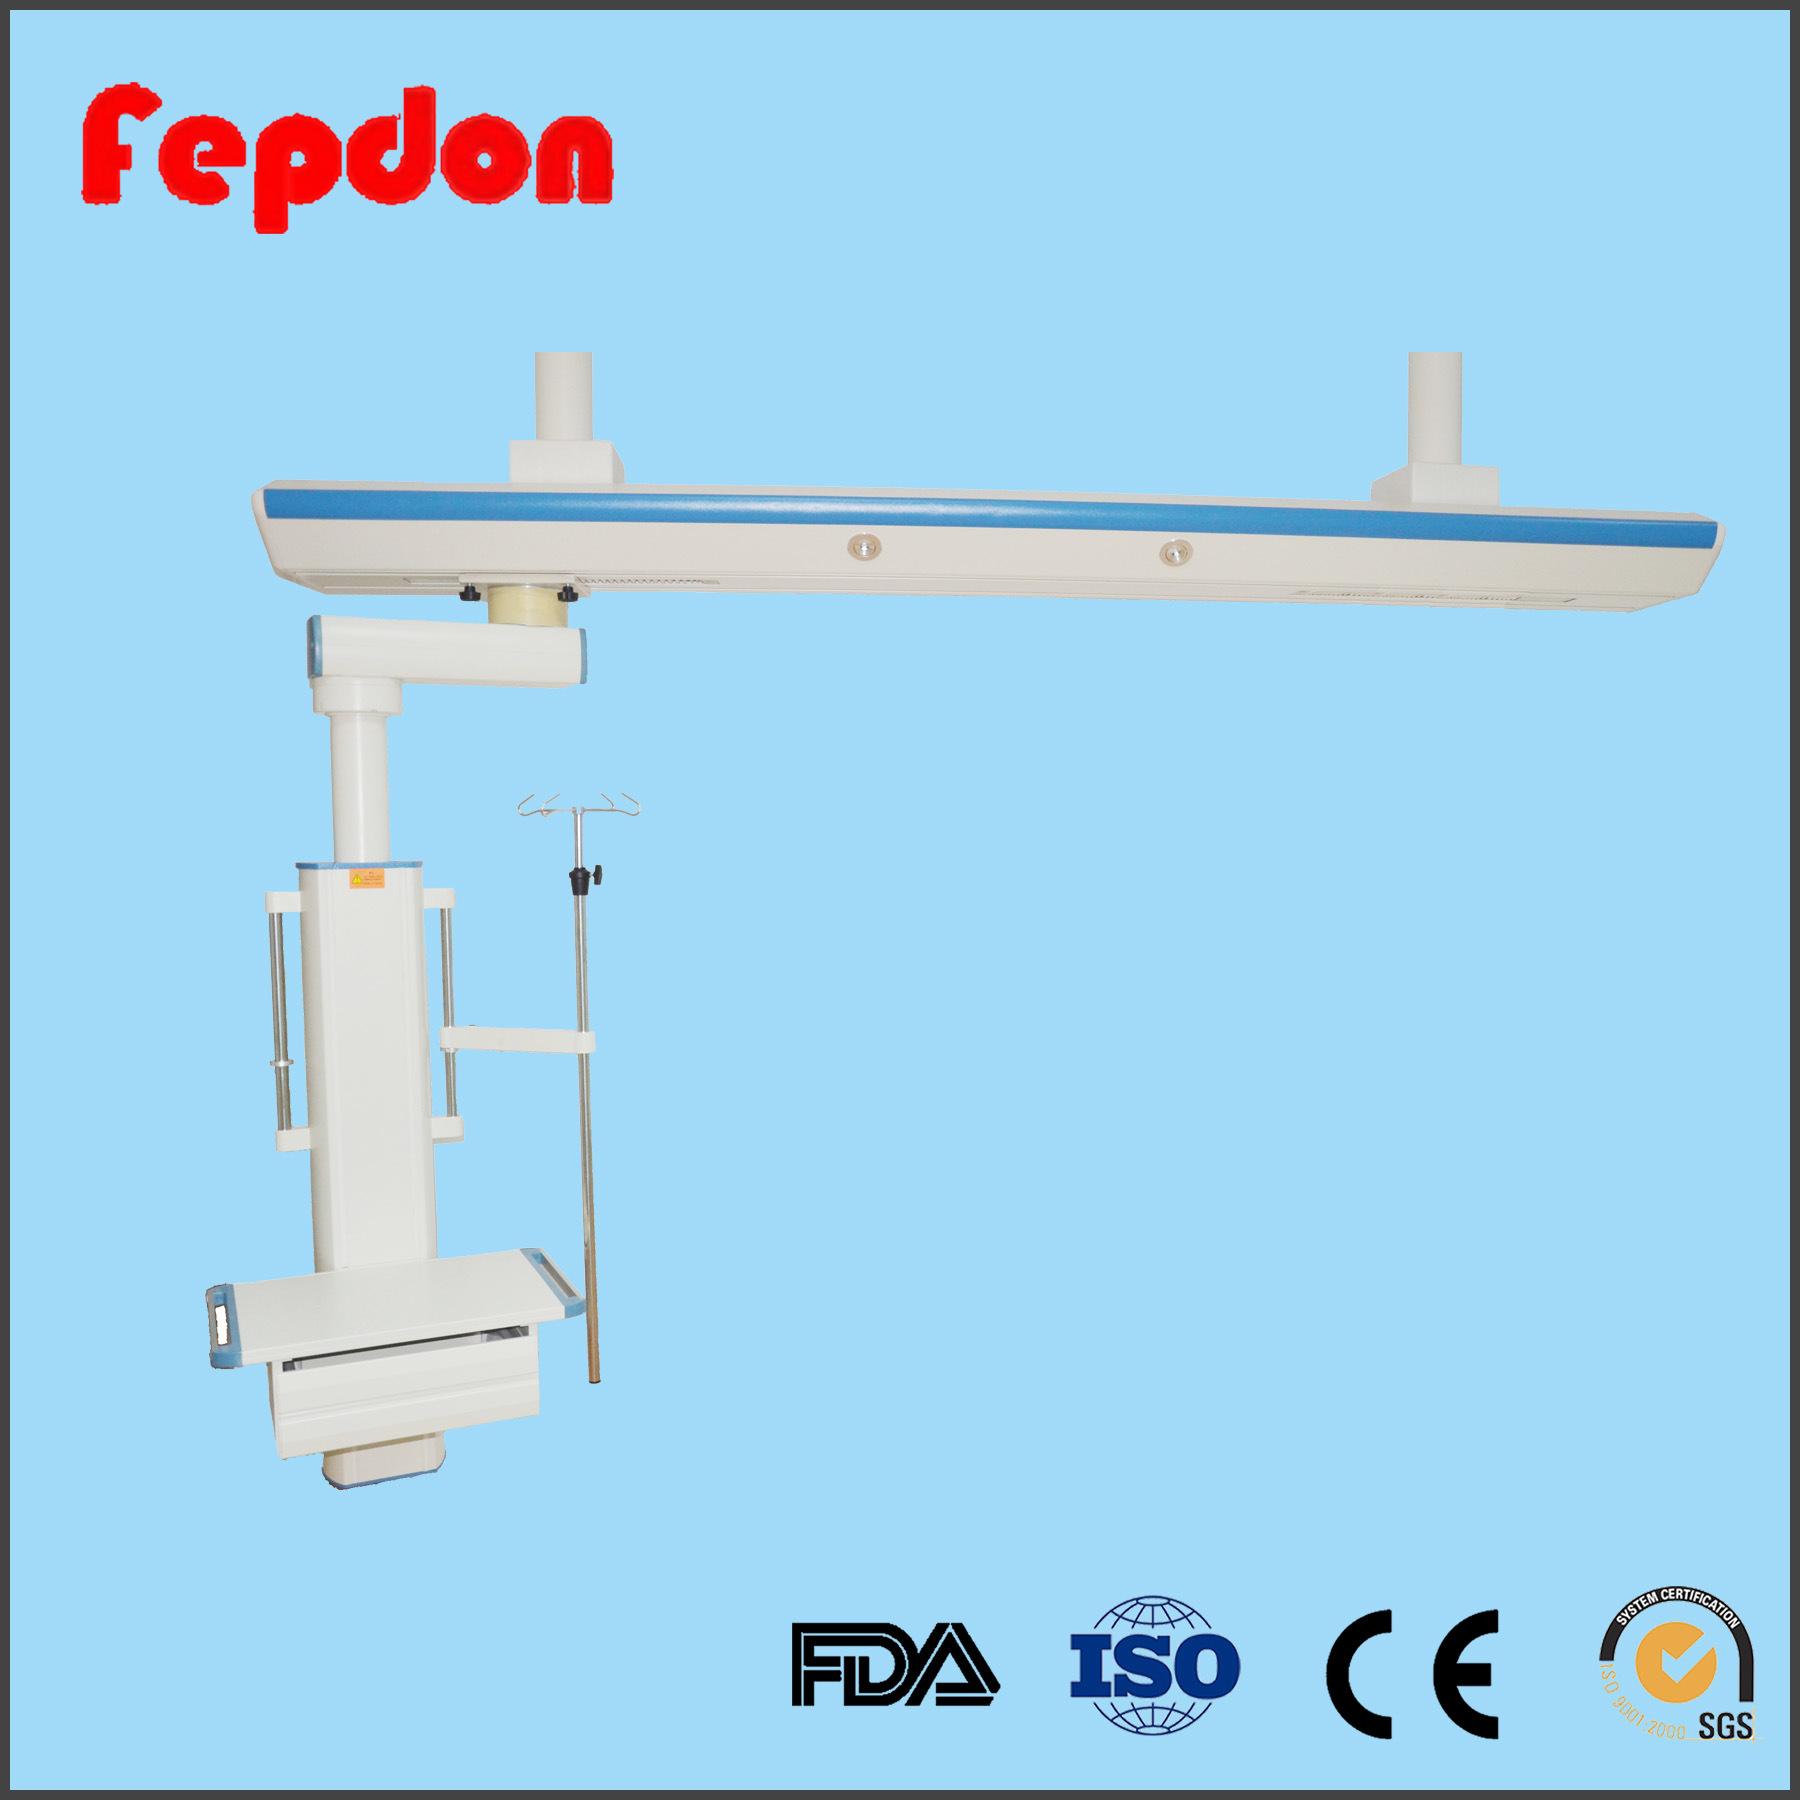 China Alluminum Alloy Medical Gas Pendant Bridge Hfp S China